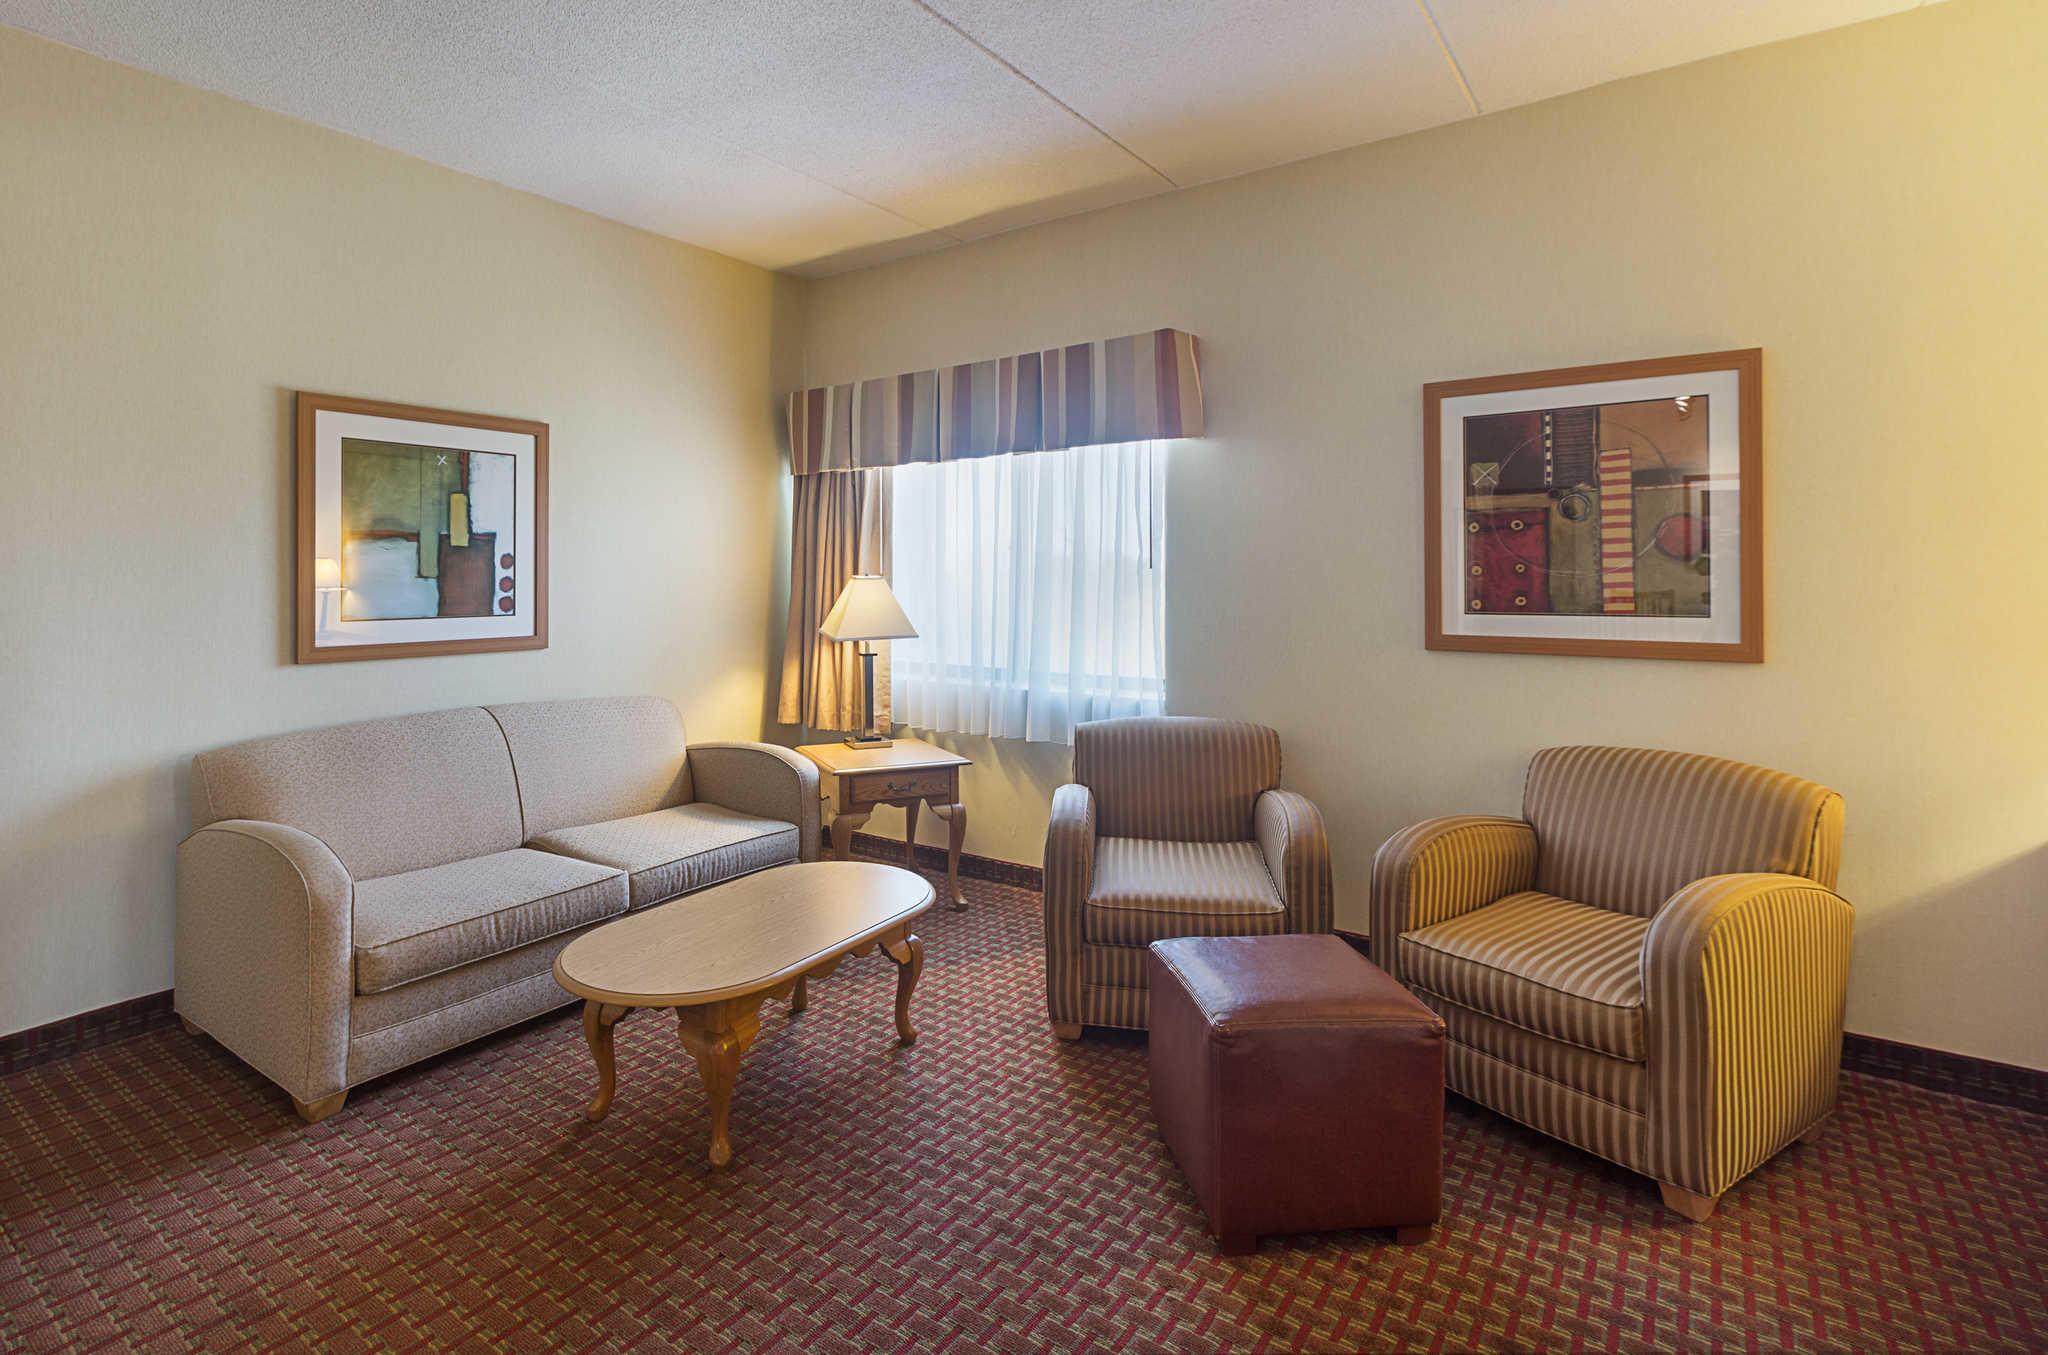 Quality Suites image 31